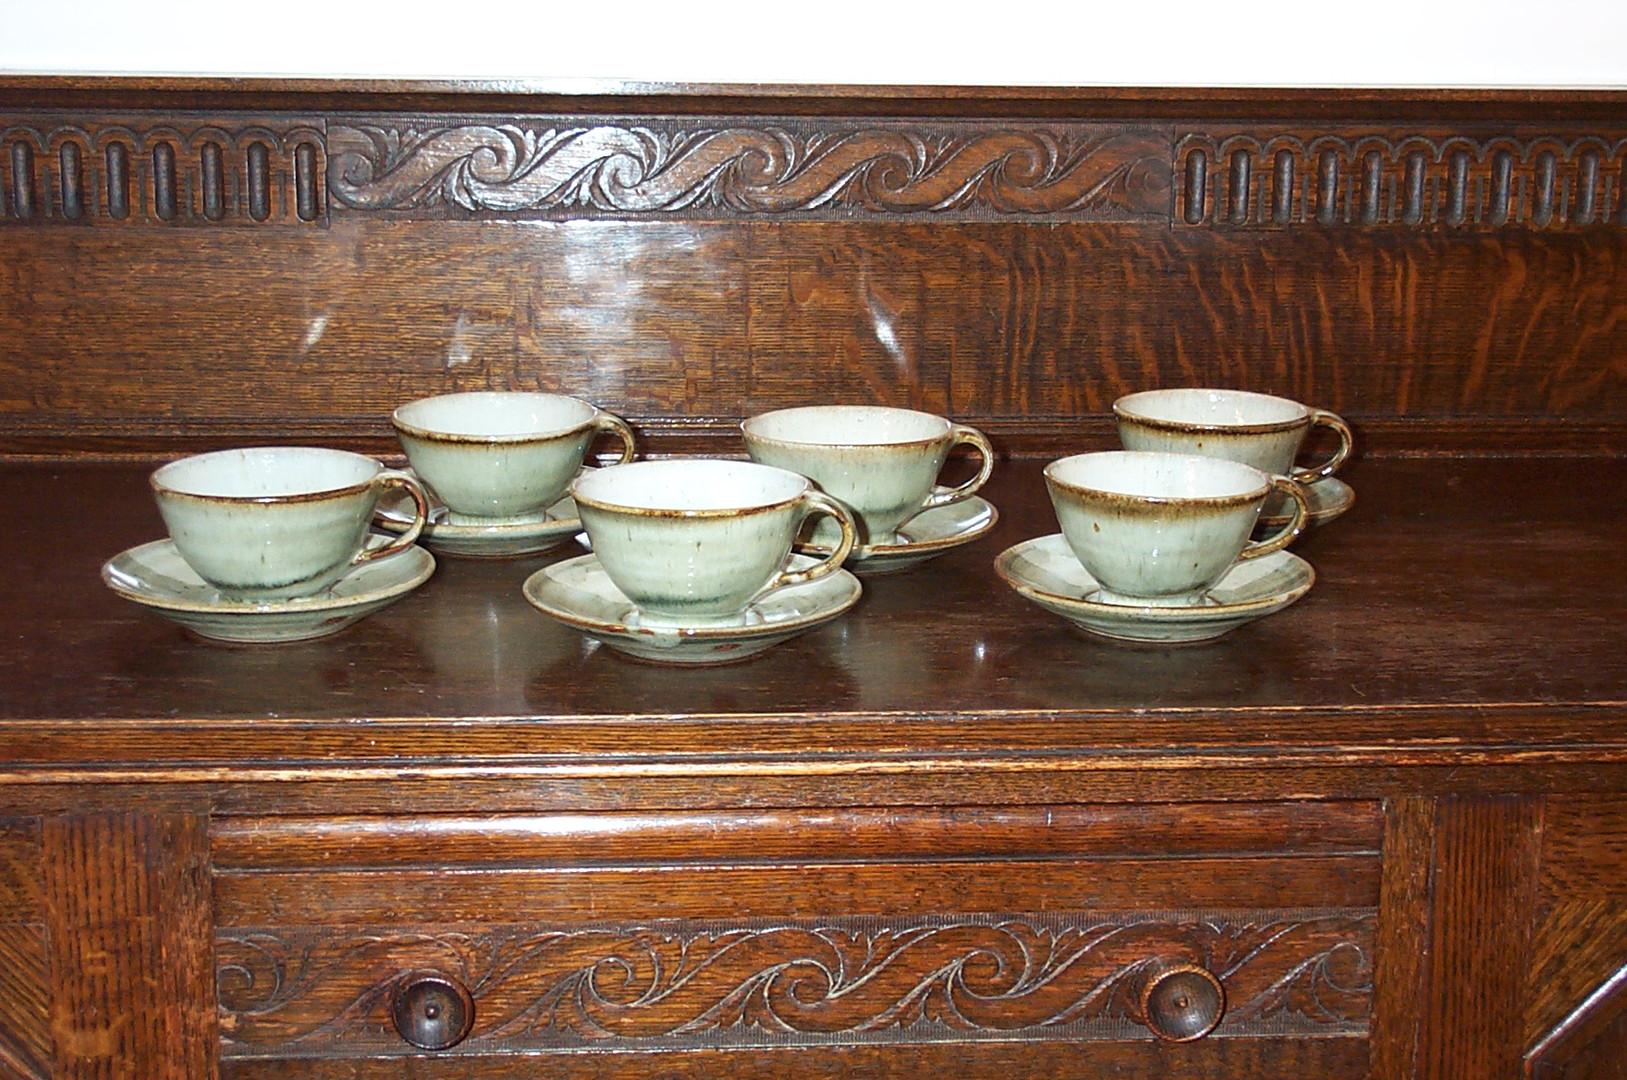 016-021  cups & saucers.jpg